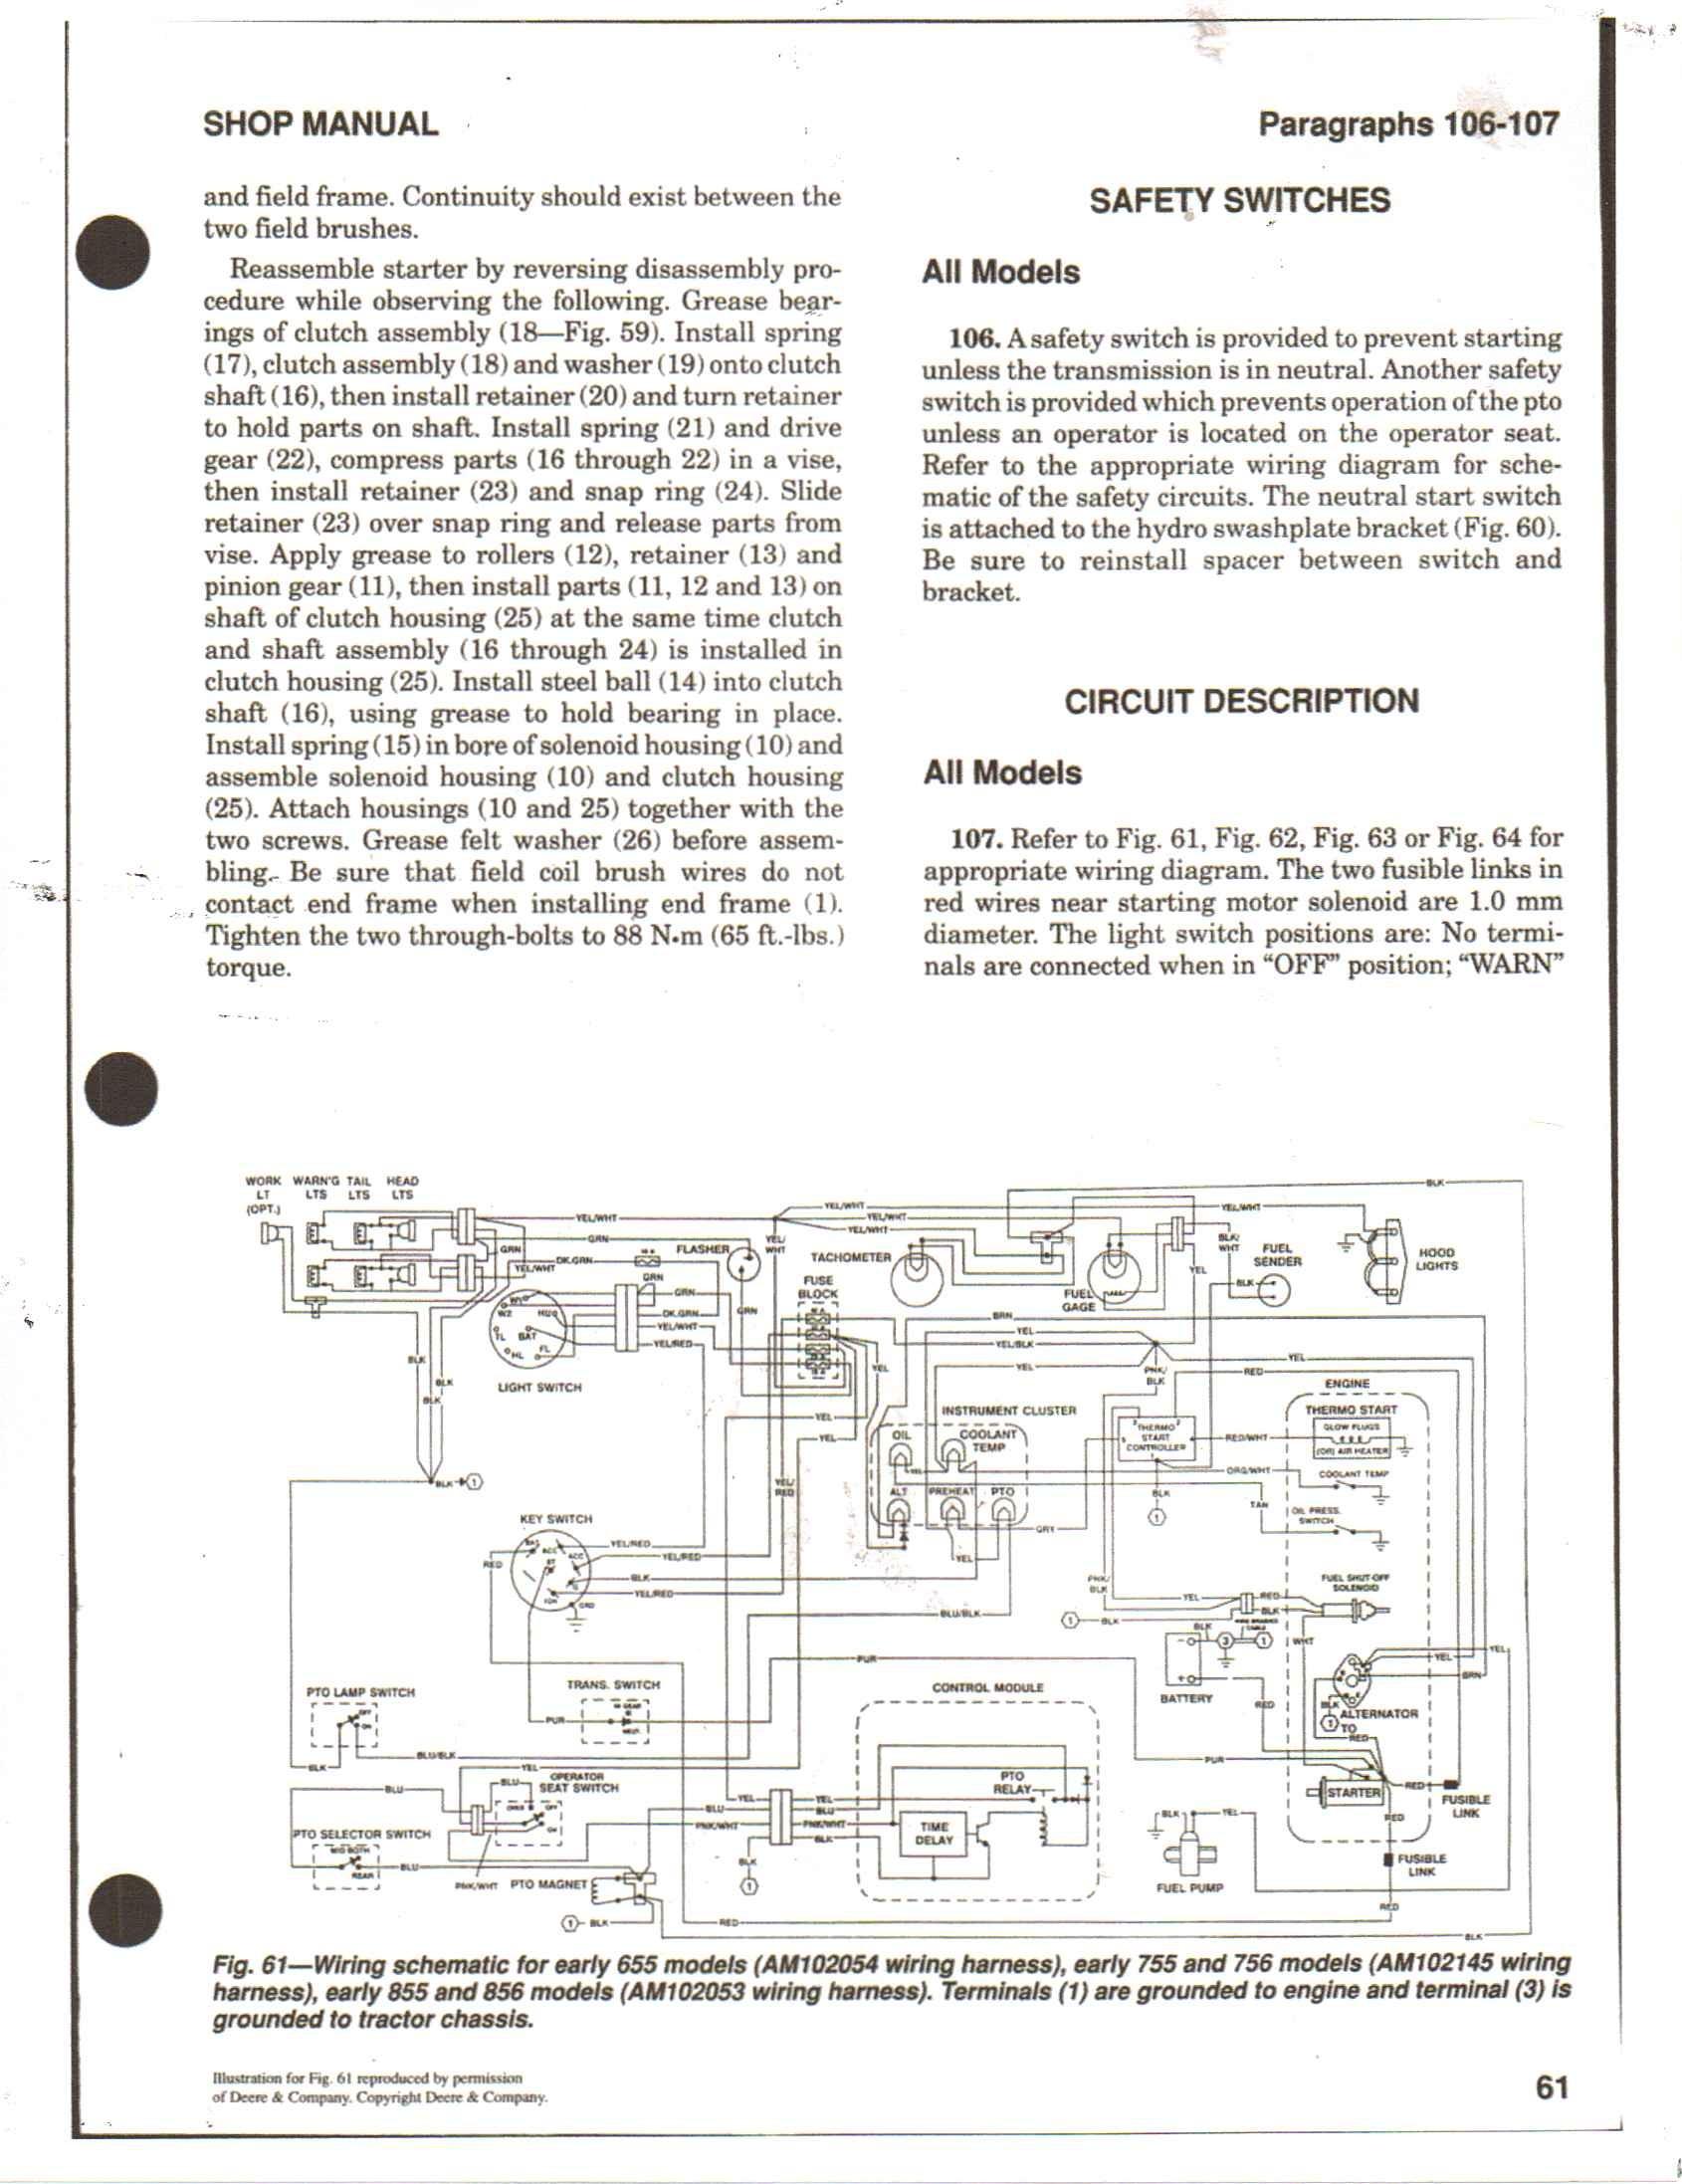 John Deere 318 Wiring Diagram Pdf 56d25 John Deere 655 Wiring Diagram Of John Deere 318 Wiring Diagram Pdf Echlin solenoid Switch Wiring Diagram